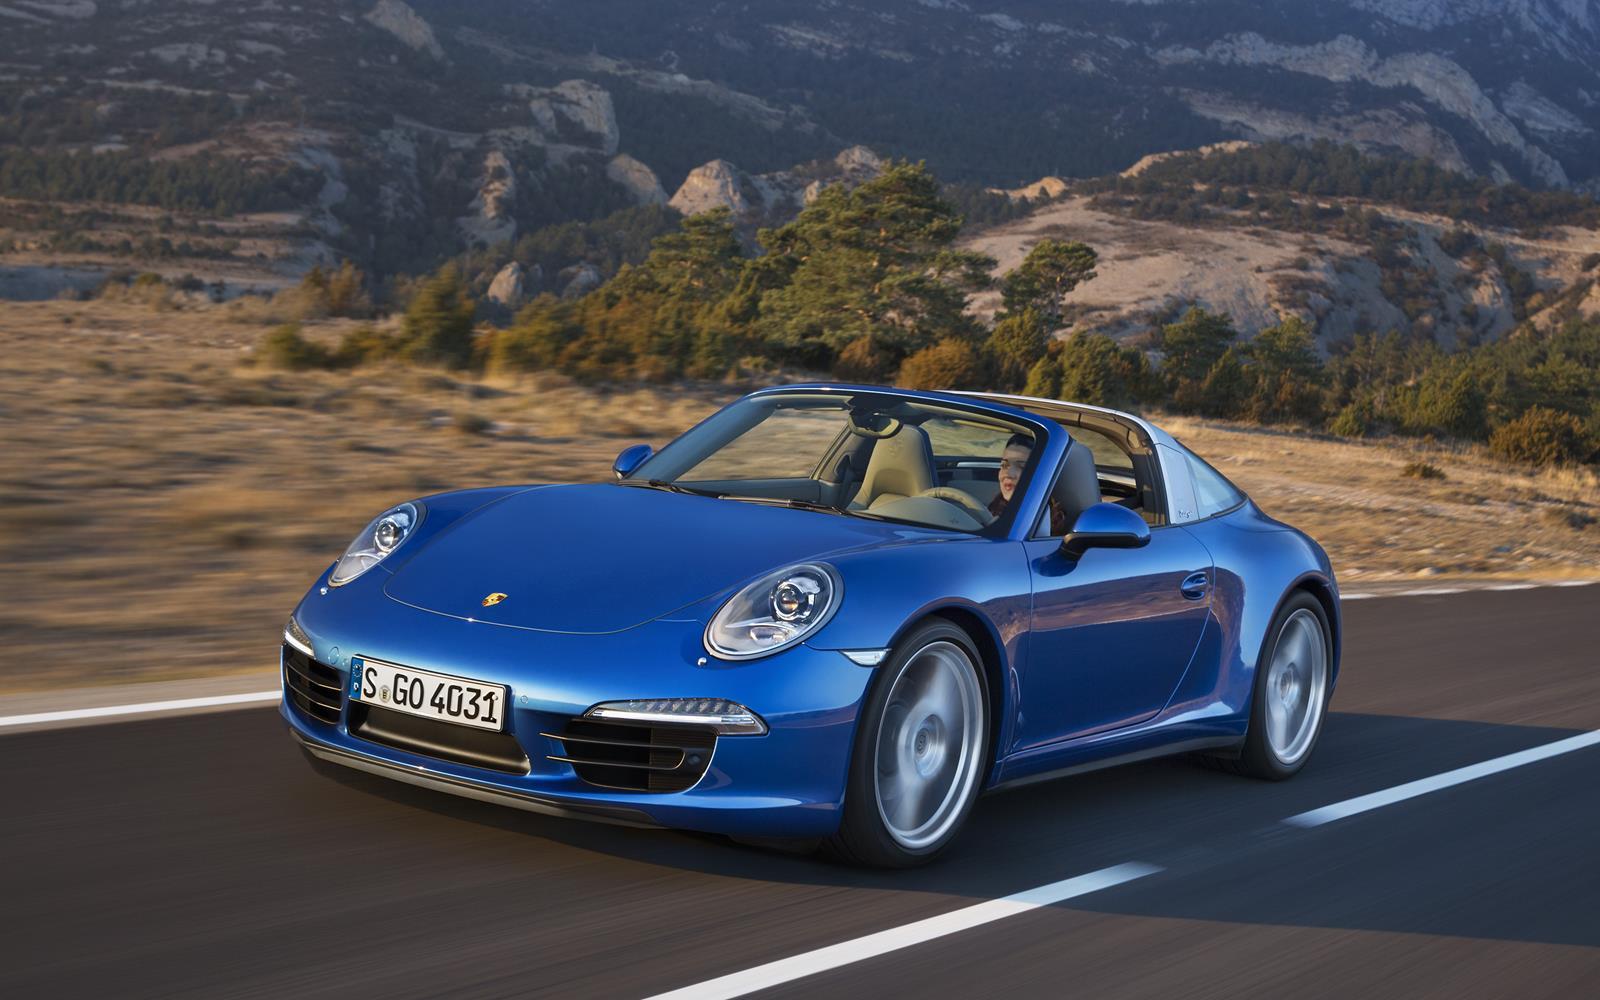 Porsche 911 Targa 4 2015 Front Dynamic